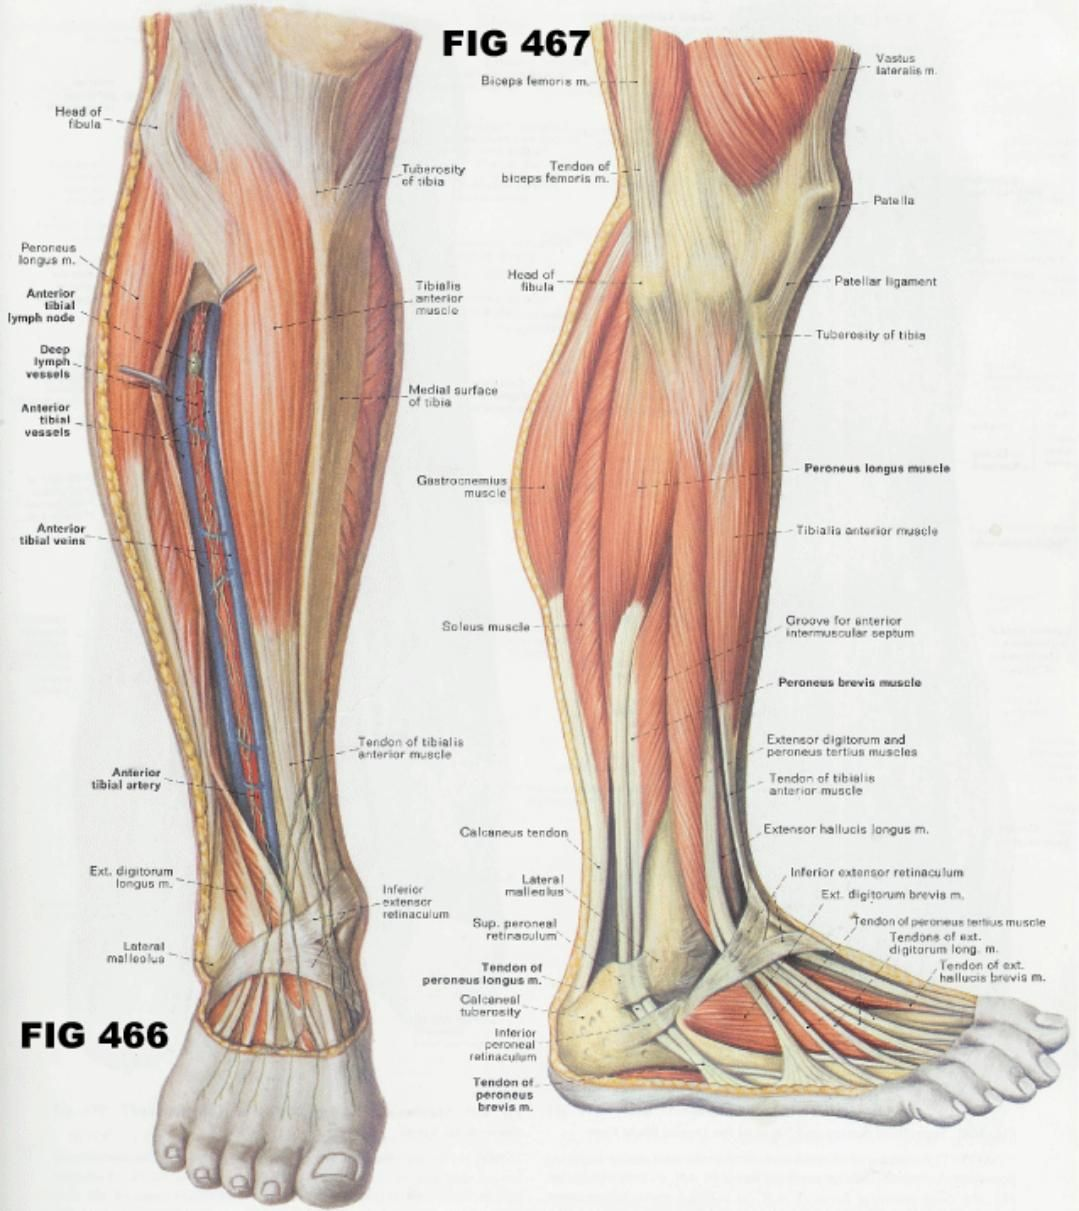 Muscular Anatomy | рельеф | Pinterest | Anatomía muscular y Anatomía